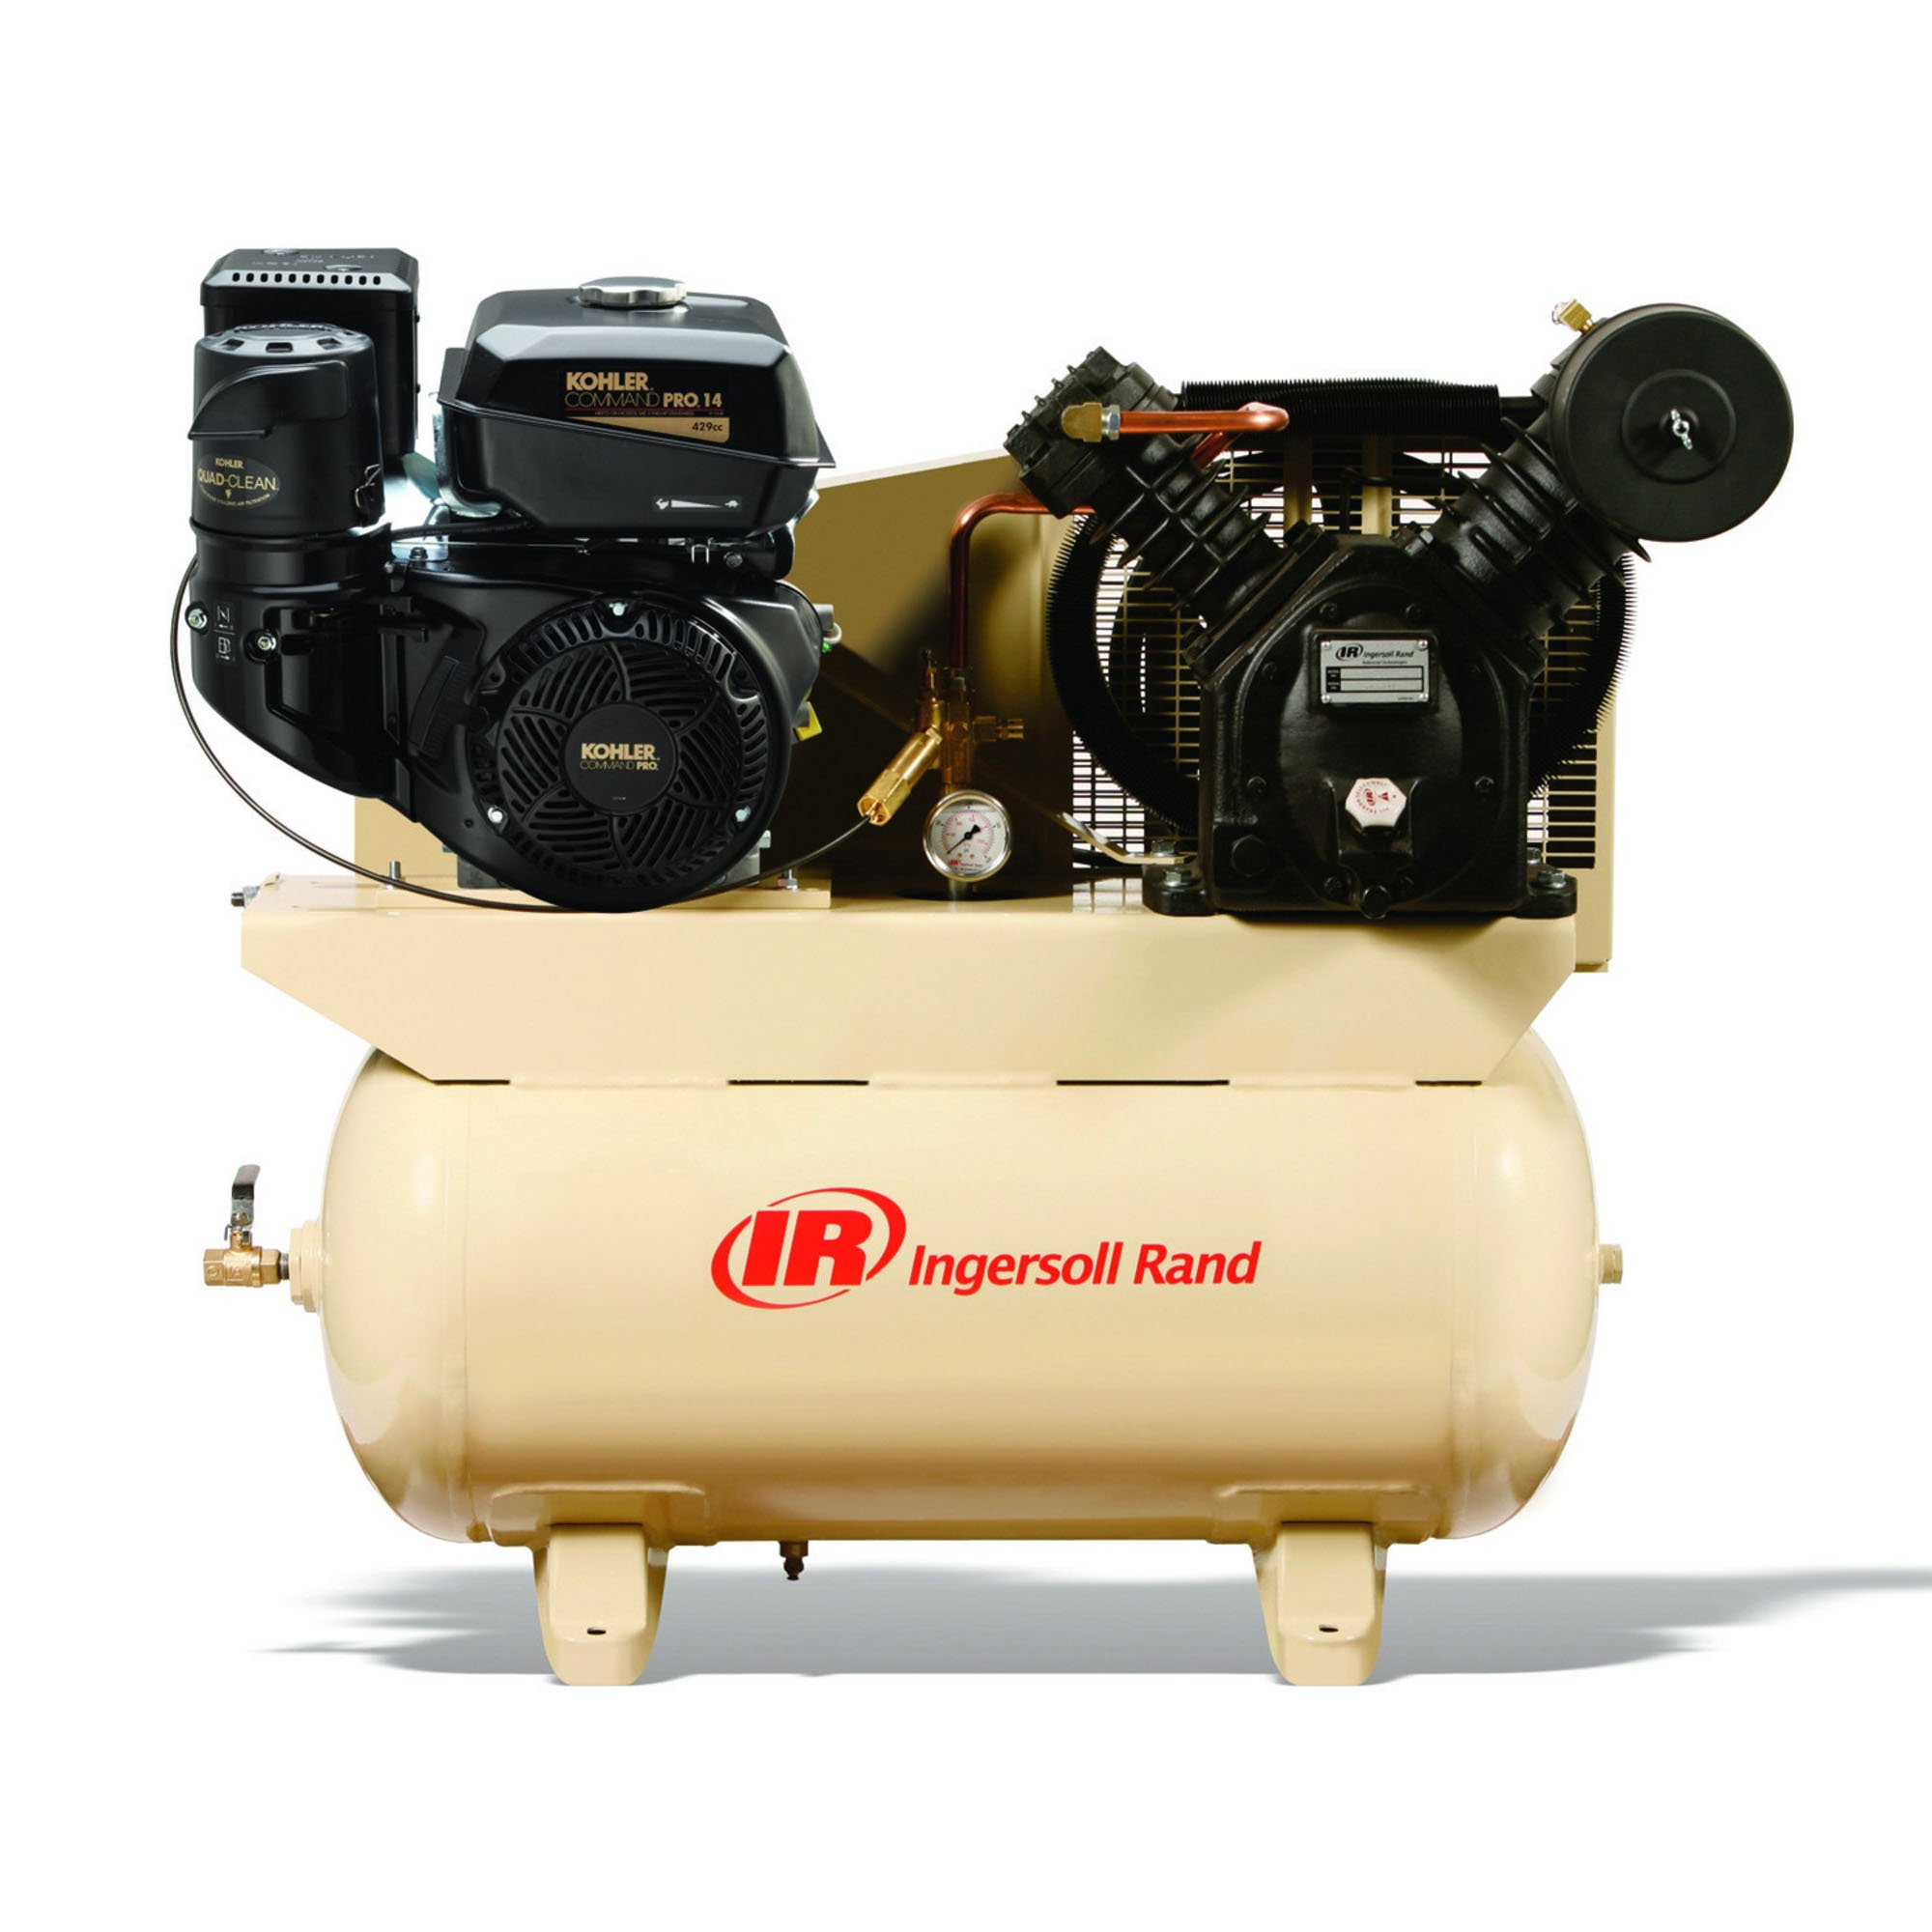 Get Quotations · - Ingersoll Rand Air Compressor - 14 HP, Model# 2475F14G